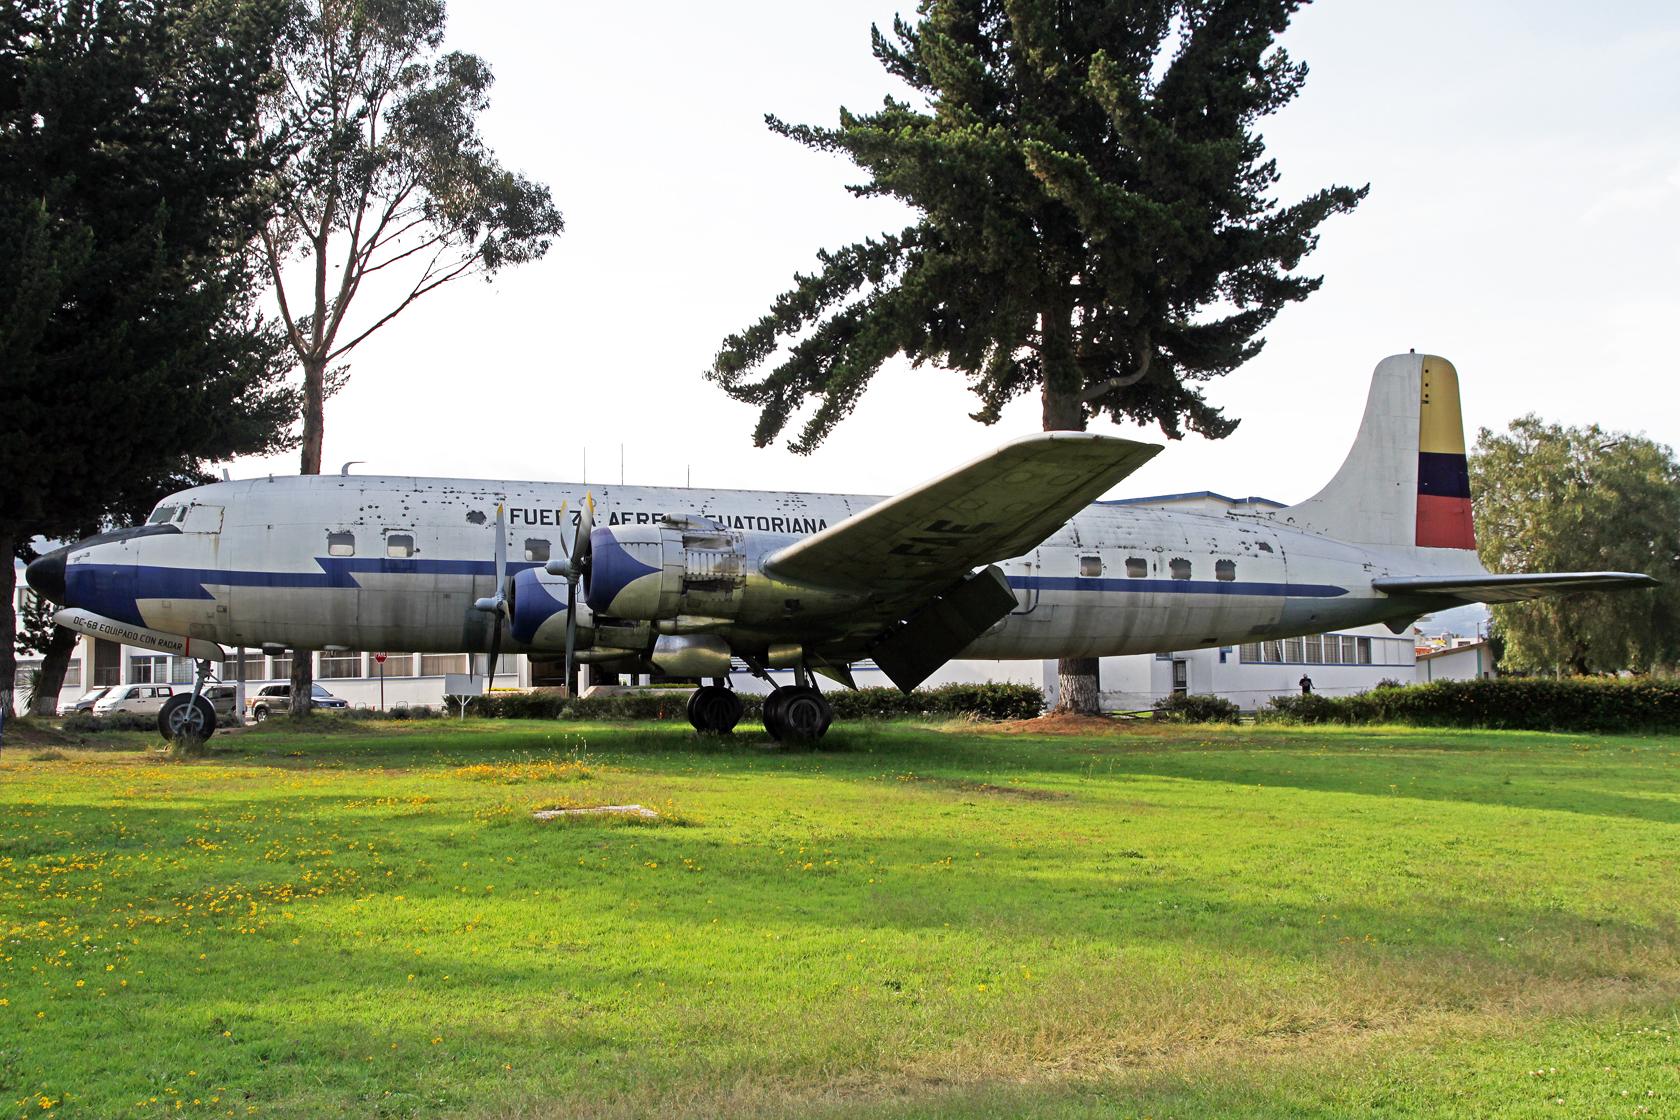 Fuerza Aérea Ecuatoriana Douglas DC-6B Cloudmaster FAE-44691